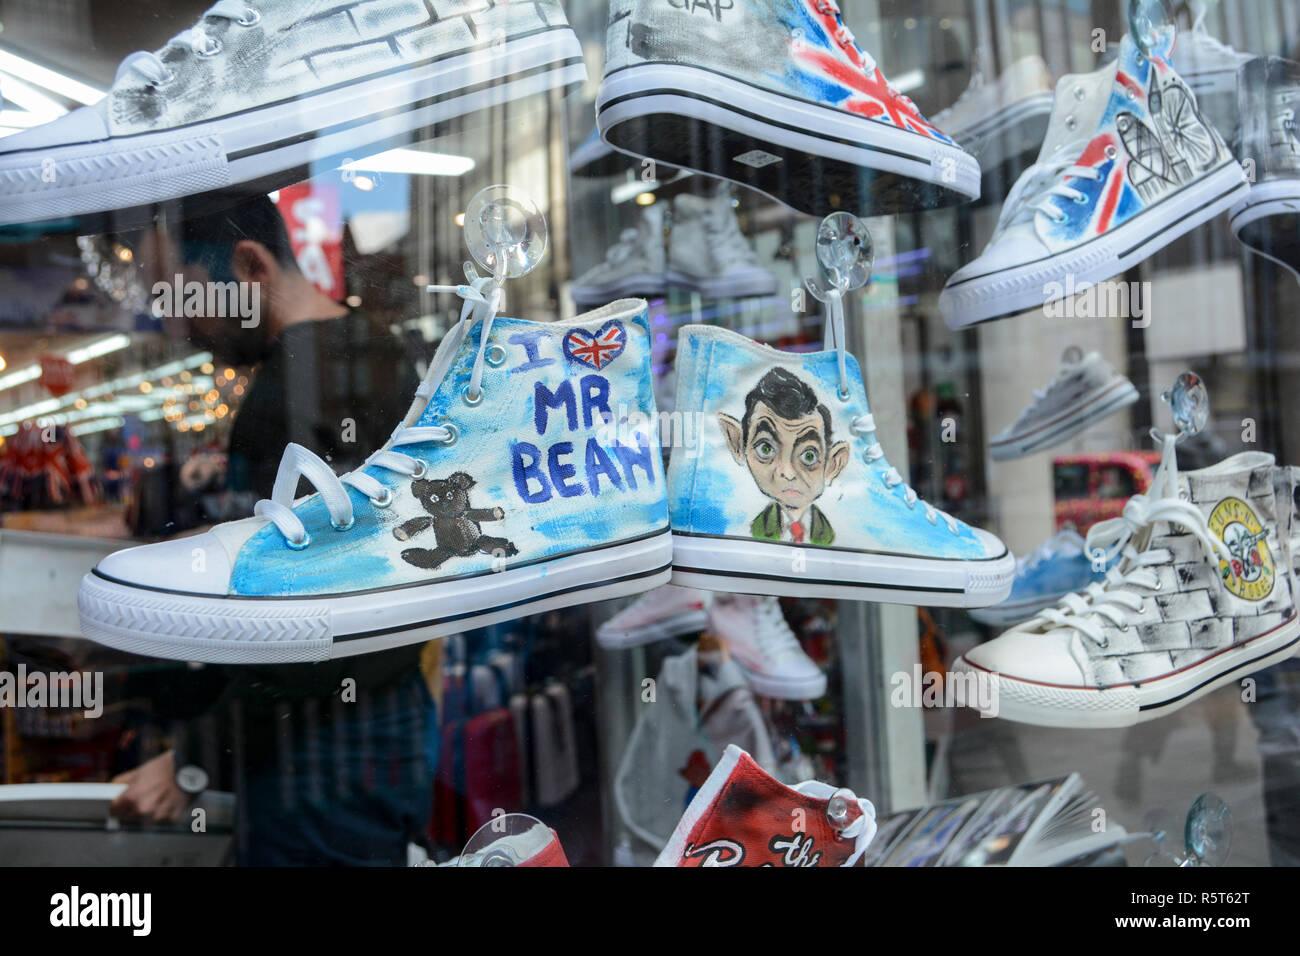 32a43d24cd27 Converse Shoe Store Stock Photos   Converse Shoe Store Stock Images ...